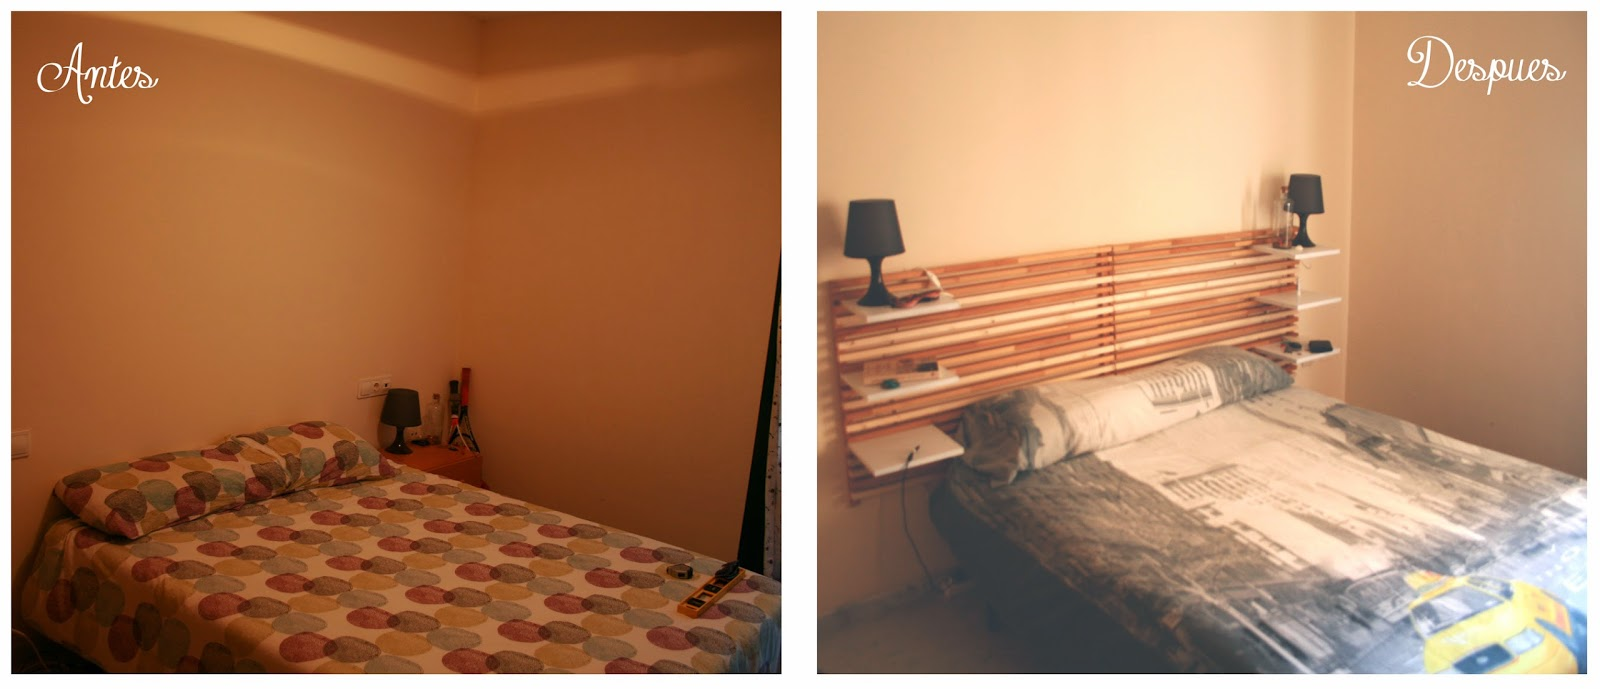 Cabecero cama de matrimonio reciclado diyambo blog - Ideas para hacer cabeceros de cama ...